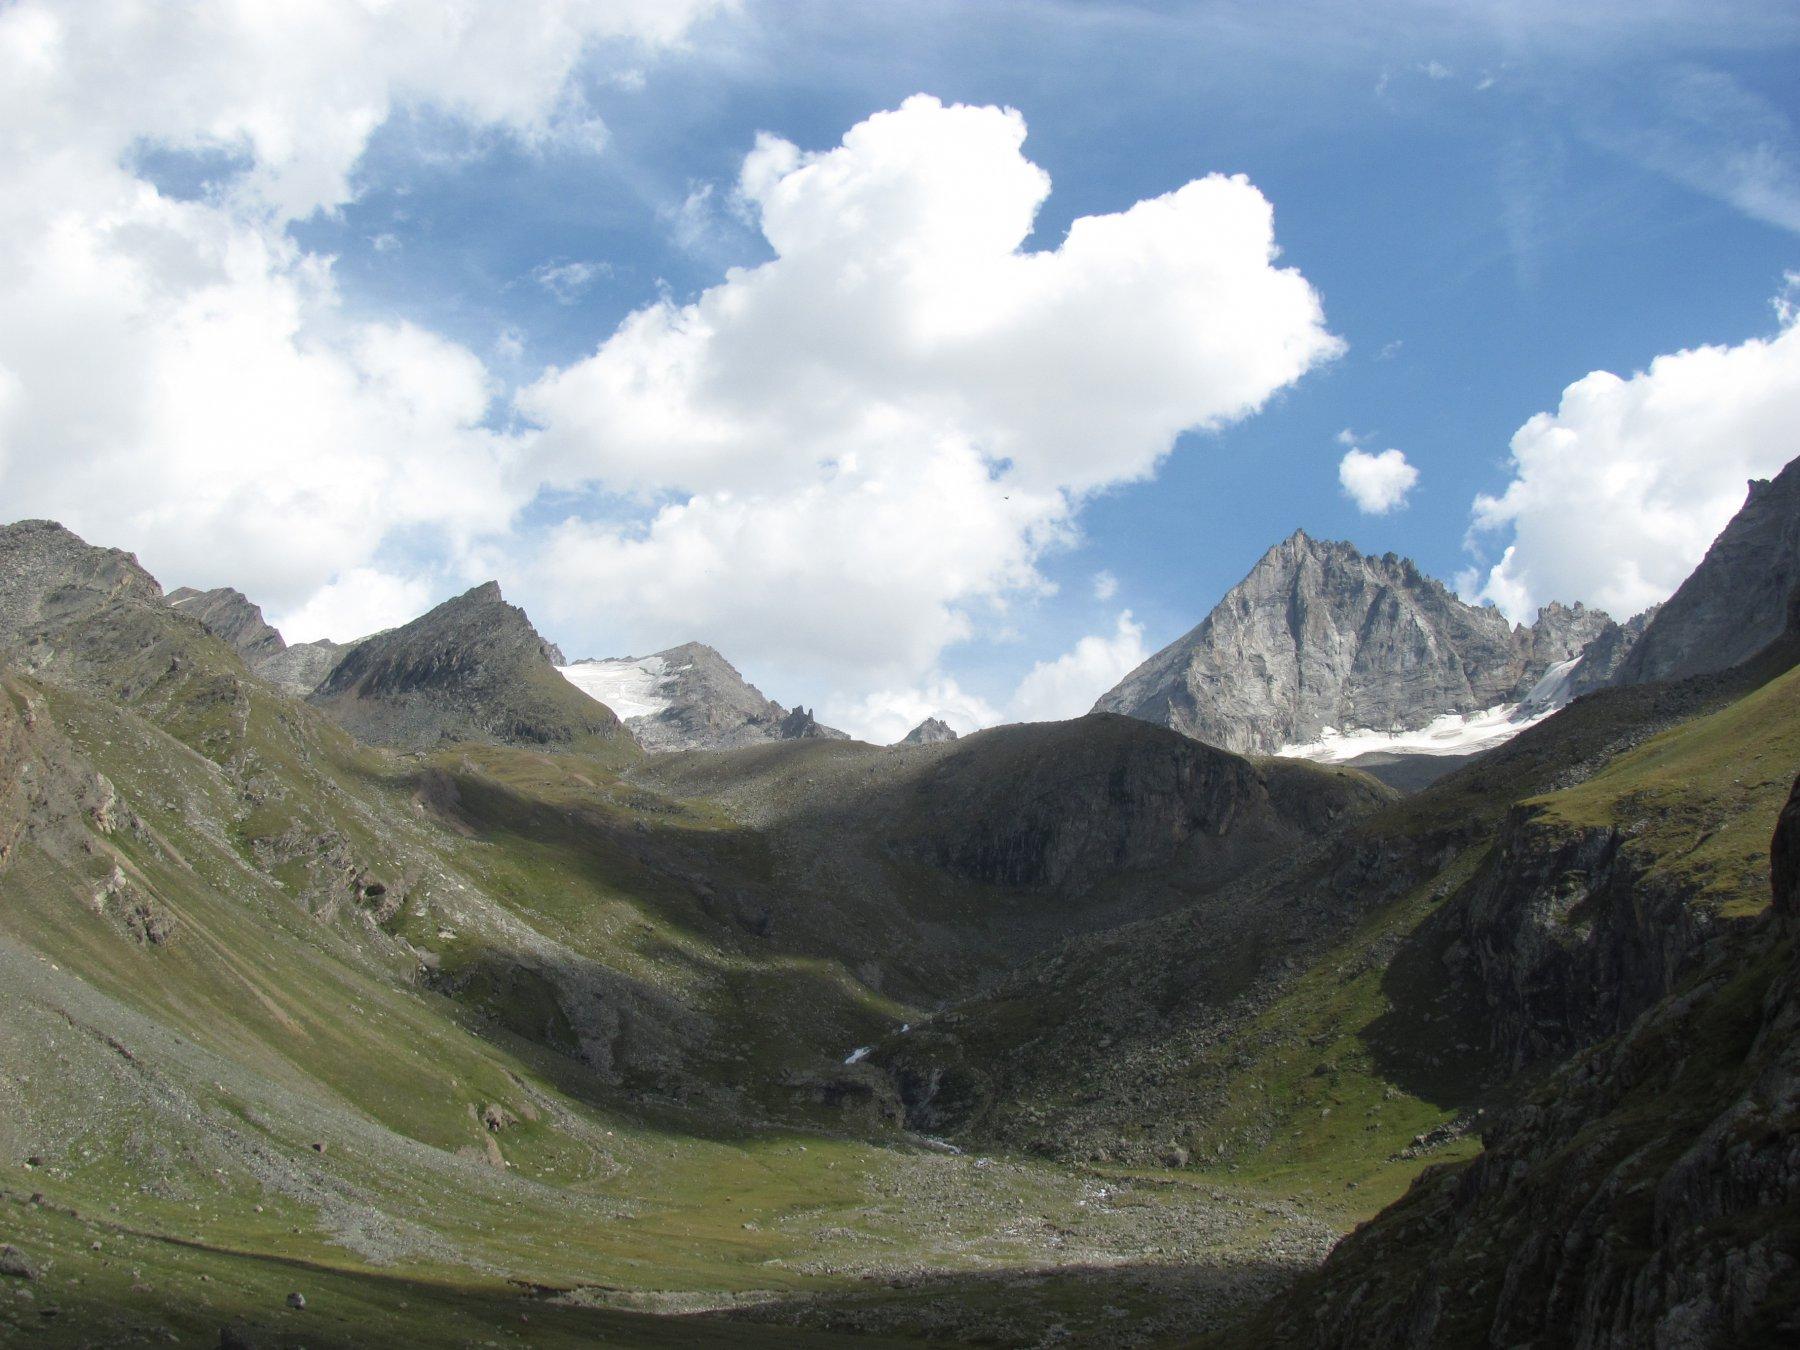 la P.ta Timorion e l'Herbetet viste dal vallone di Levionaz